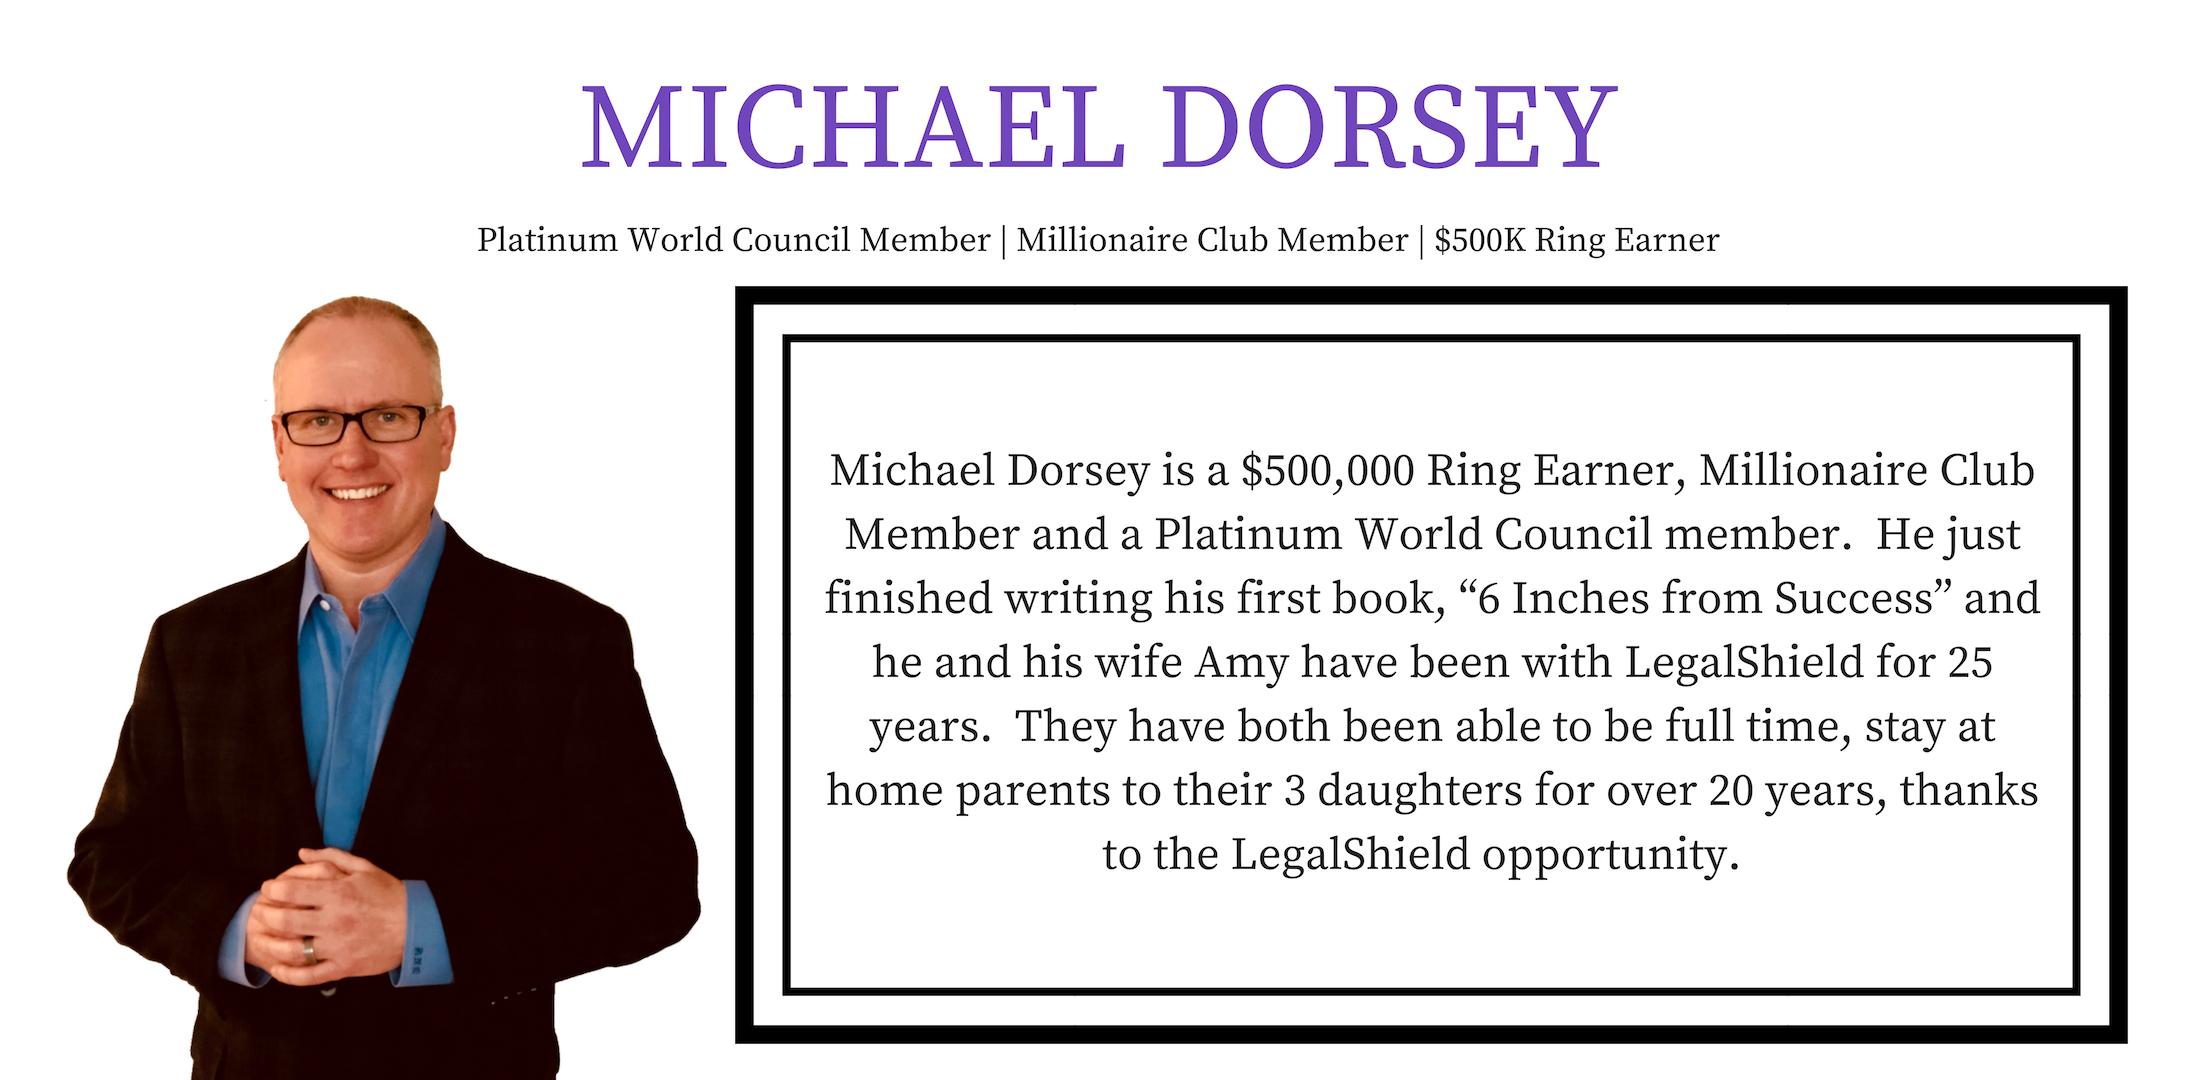 MichaelDorsey